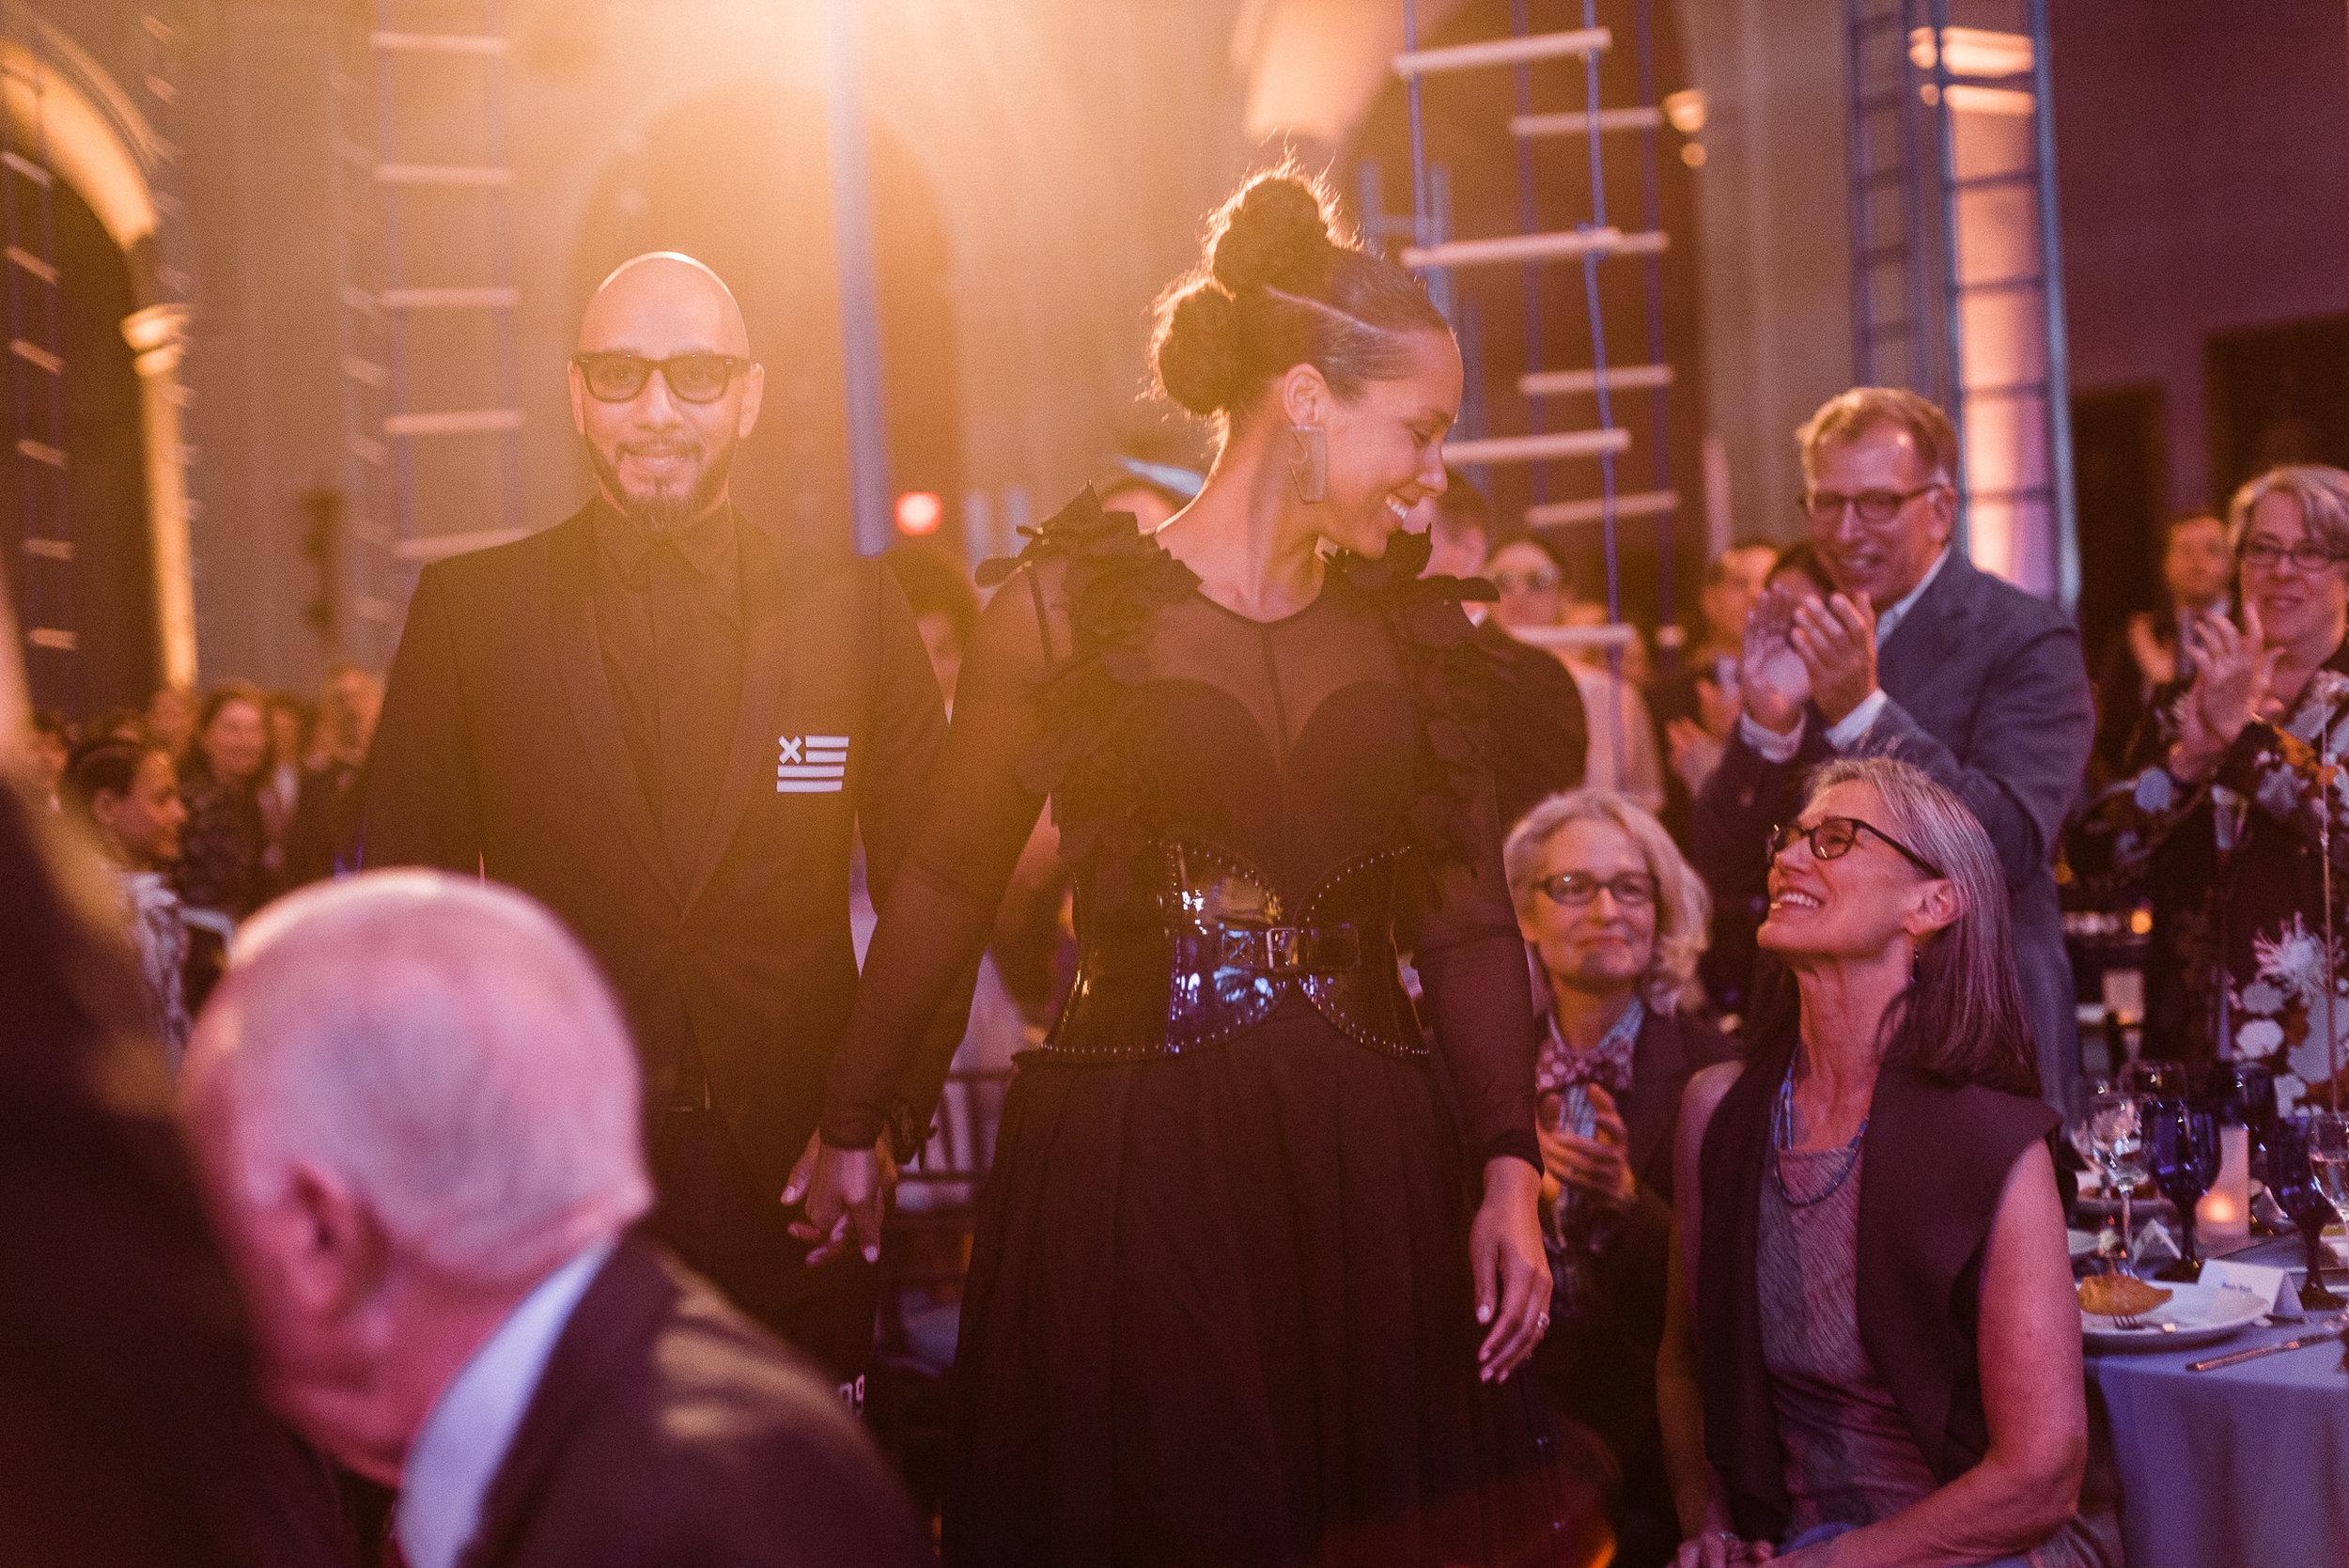 The Brooklyn Artists Ball at Brooklyn Museum 2017. Swizz Beats and Alicia Keys recieve their honorary award